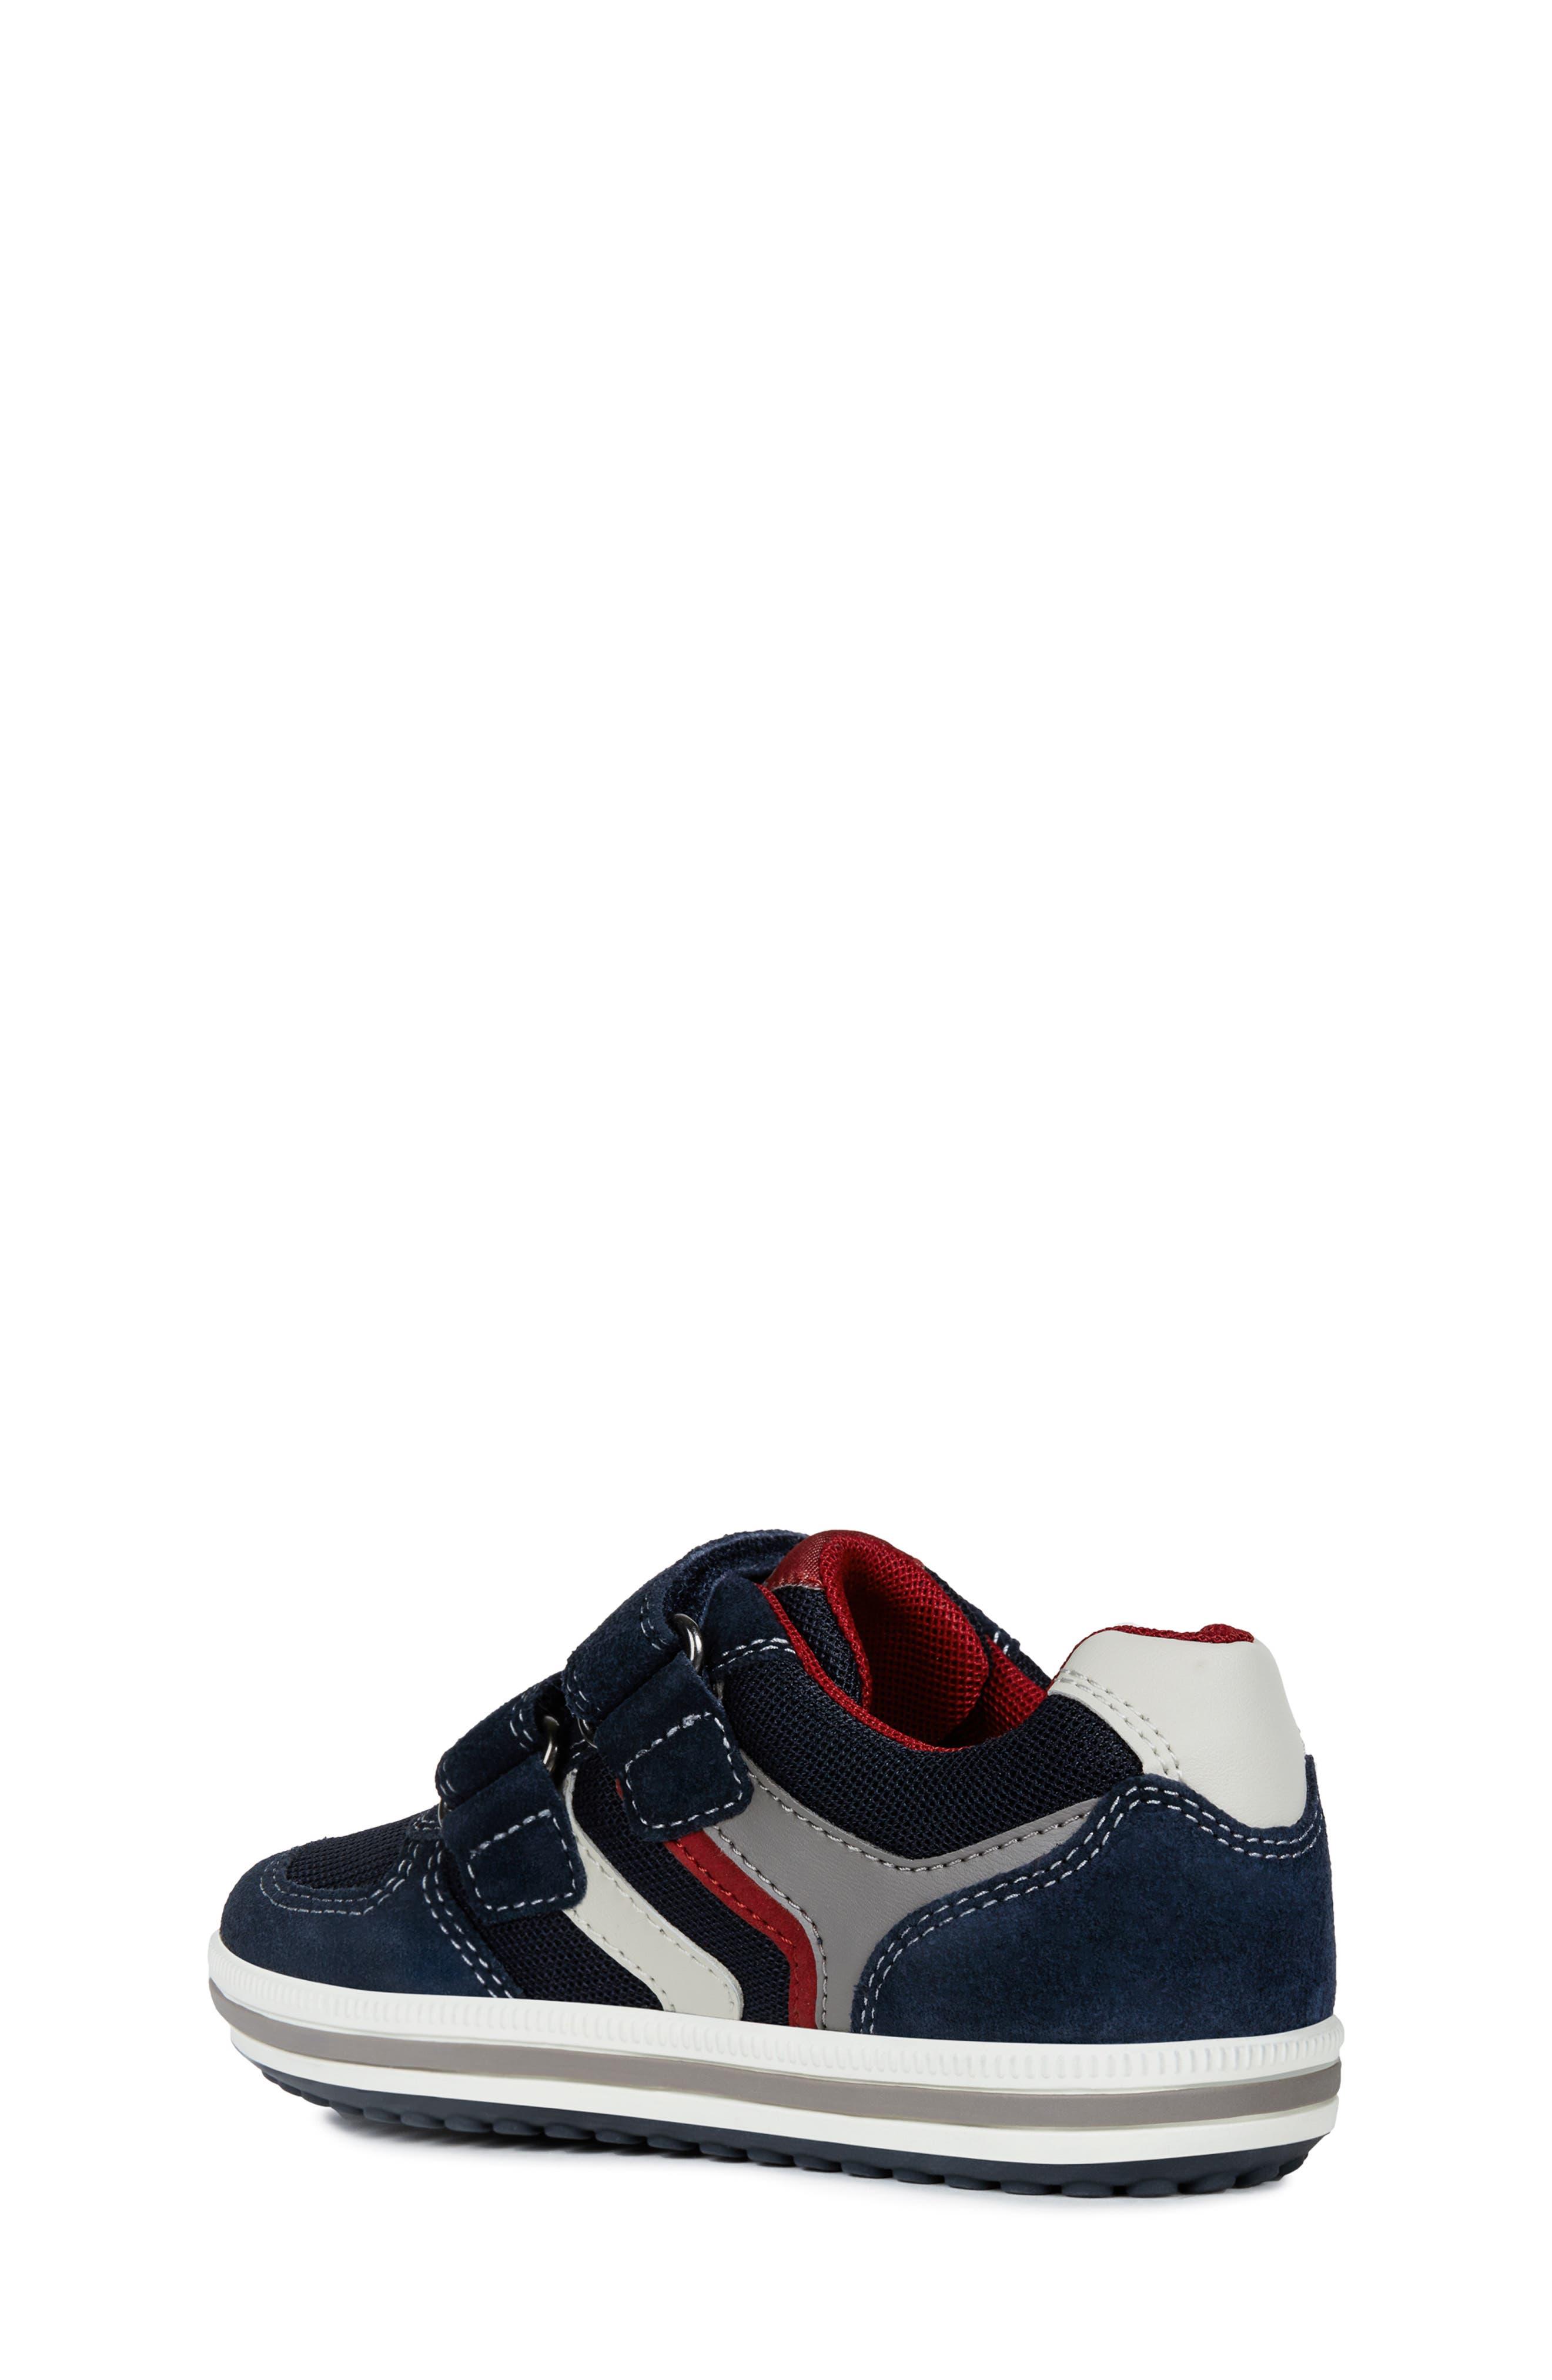 GEOX, 'Vita' Sneaker, Alternate thumbnail 2, color, NAVY/ RED